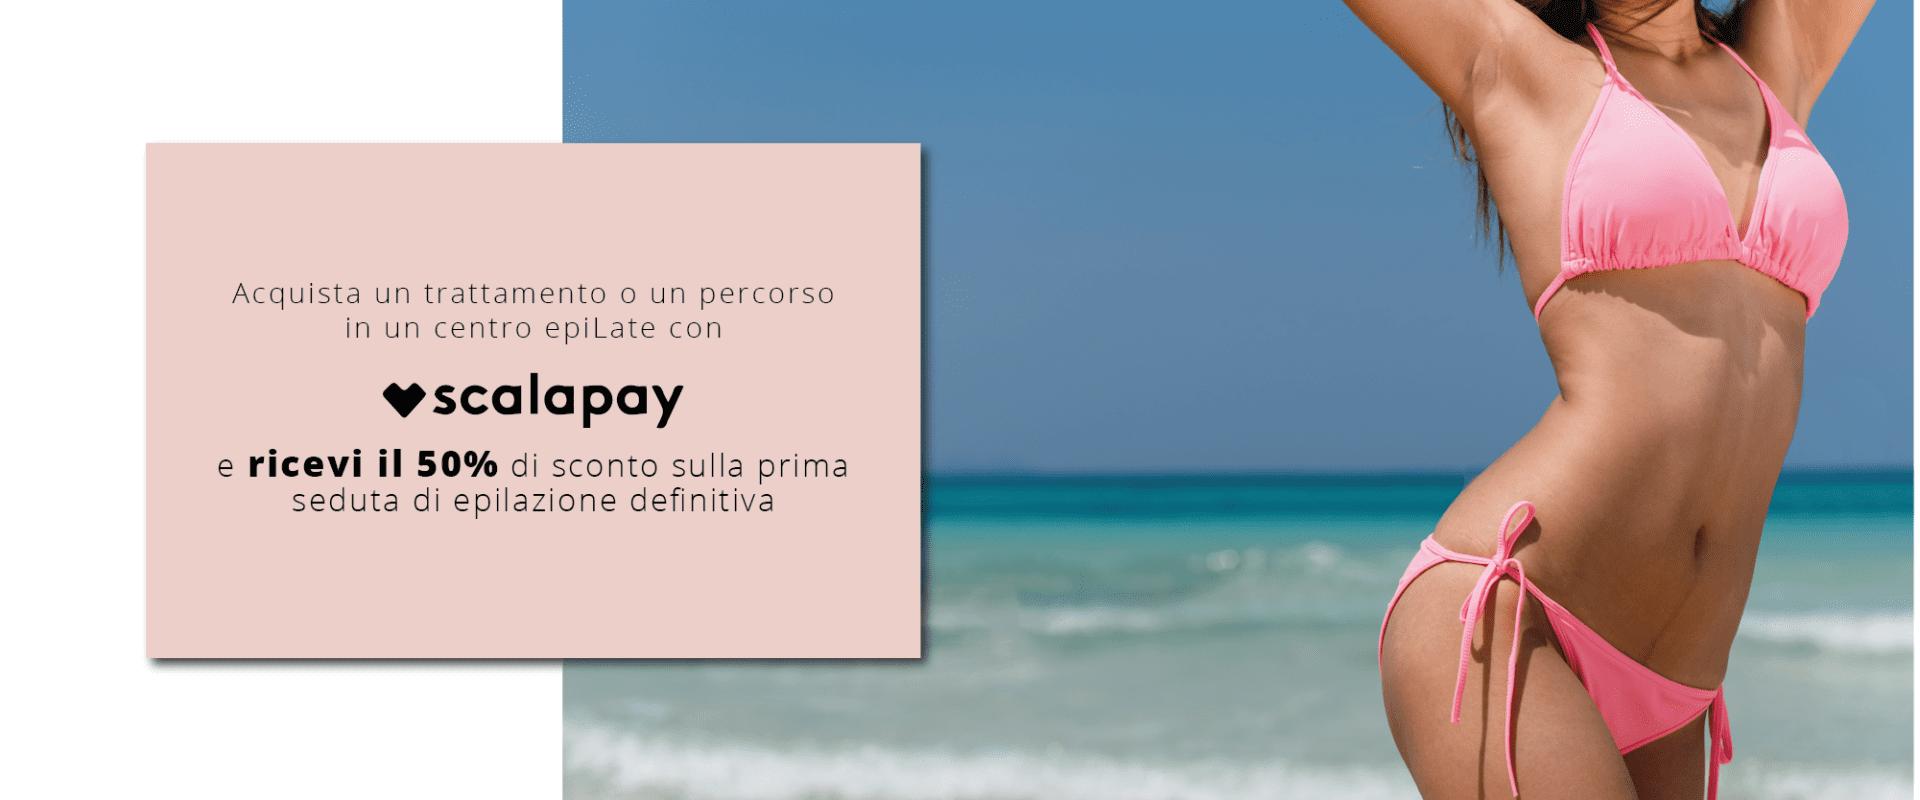 Promo Scalapay